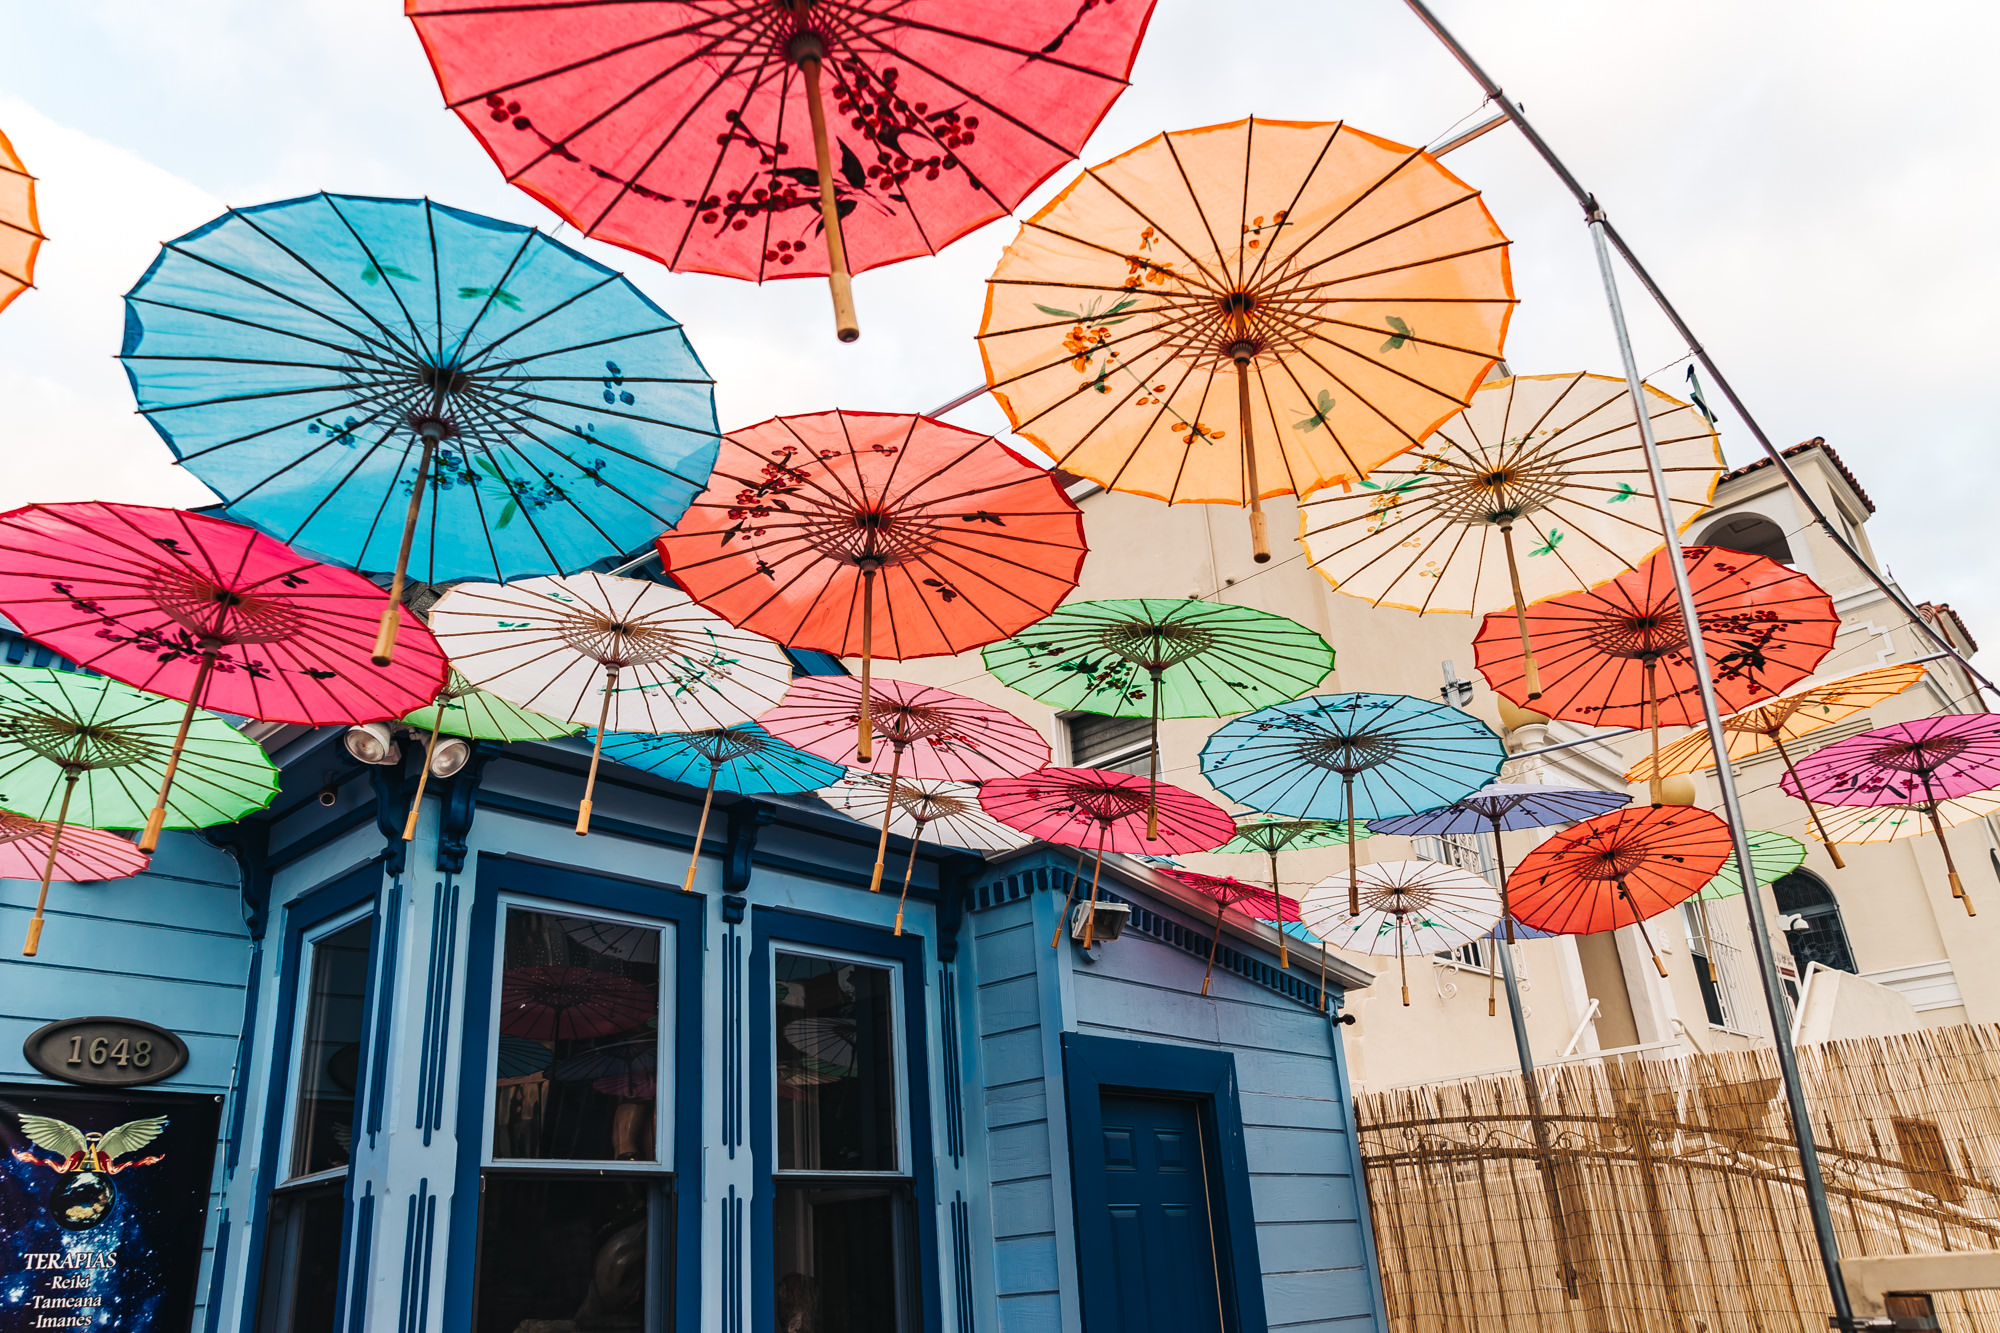 Colorful Umbrellas at a Small Boutique